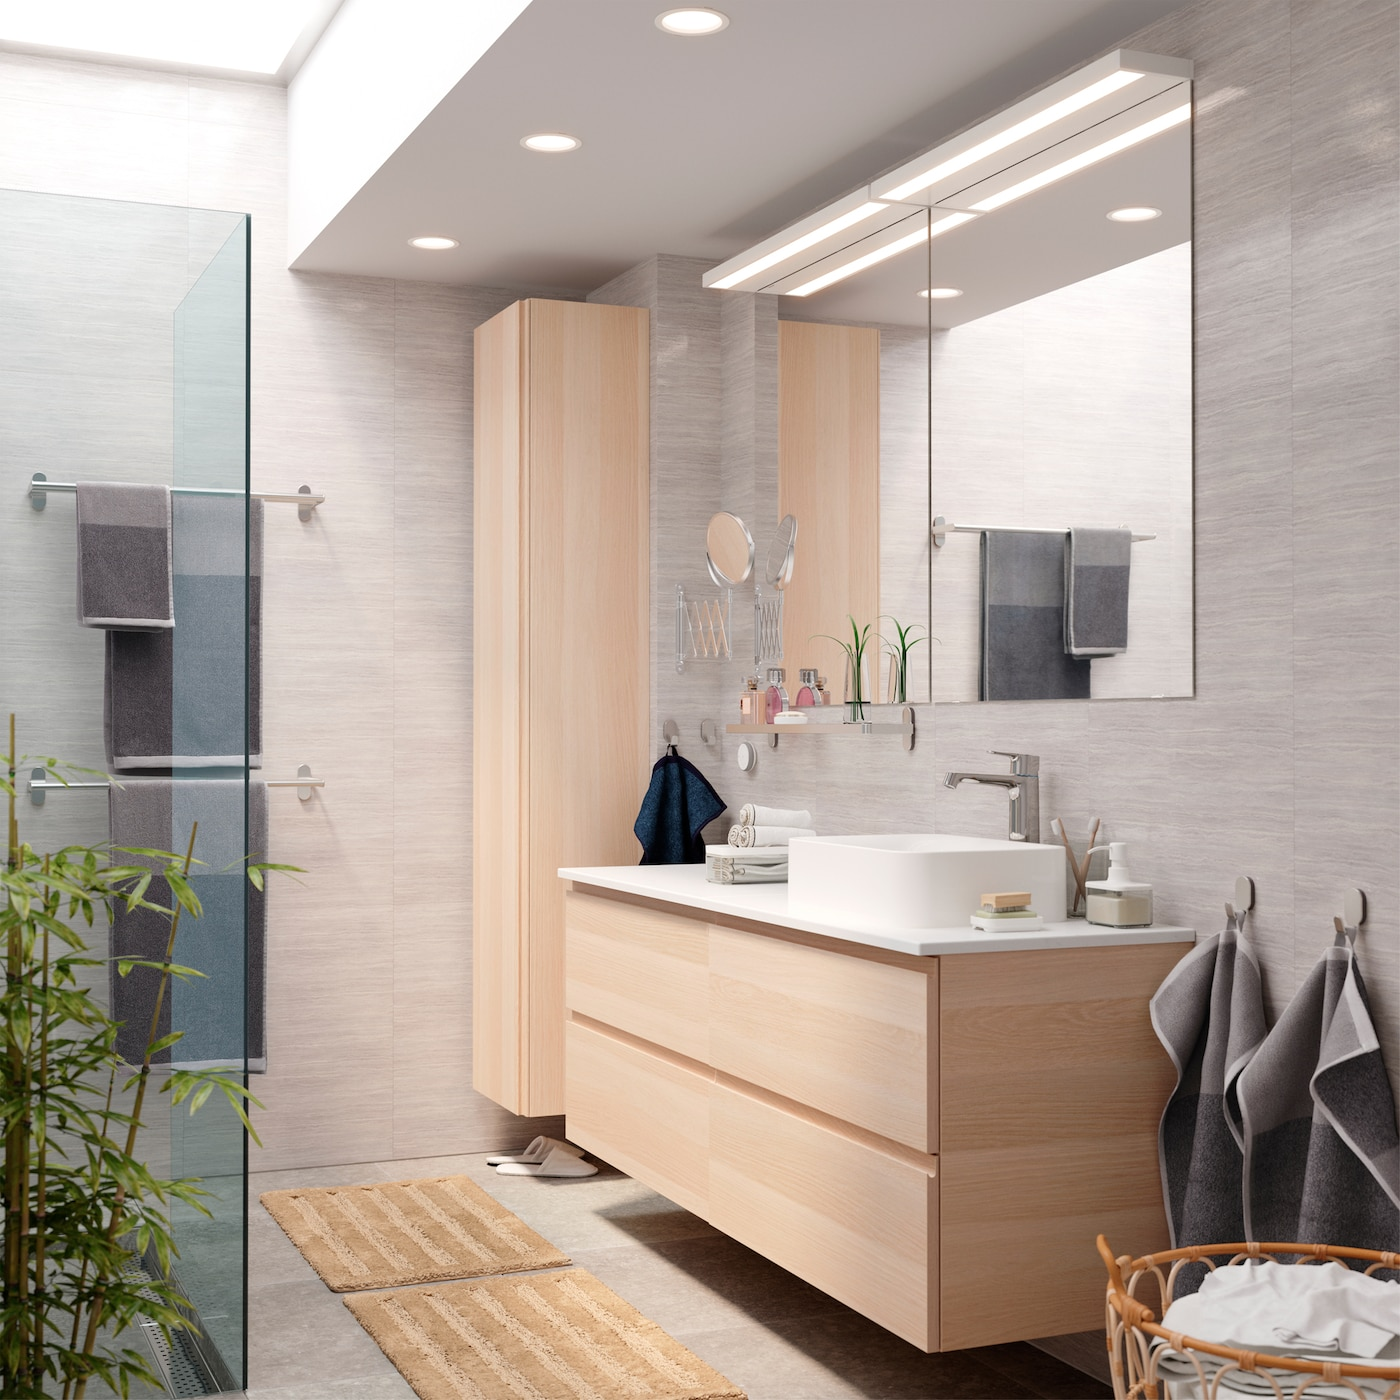 Effective Bathroom Storage Ideas UAE - IKEA